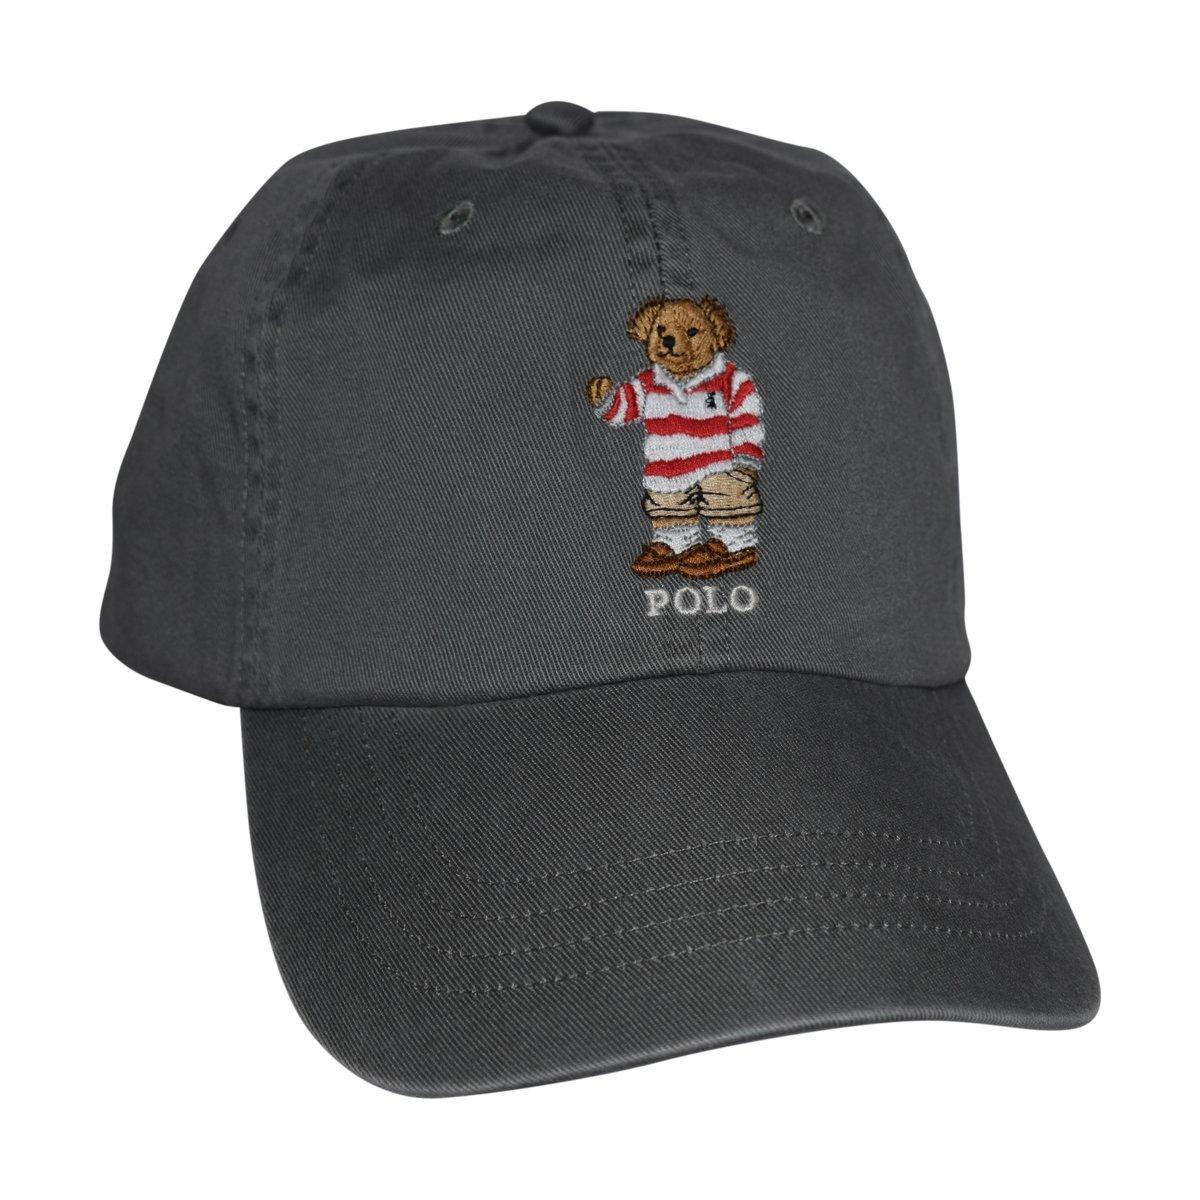 008b4d876 Polo Ralph Lauren Mens Teddy Bear Adjustable Ball Cap Hat (One Size,  Colgate Grey)